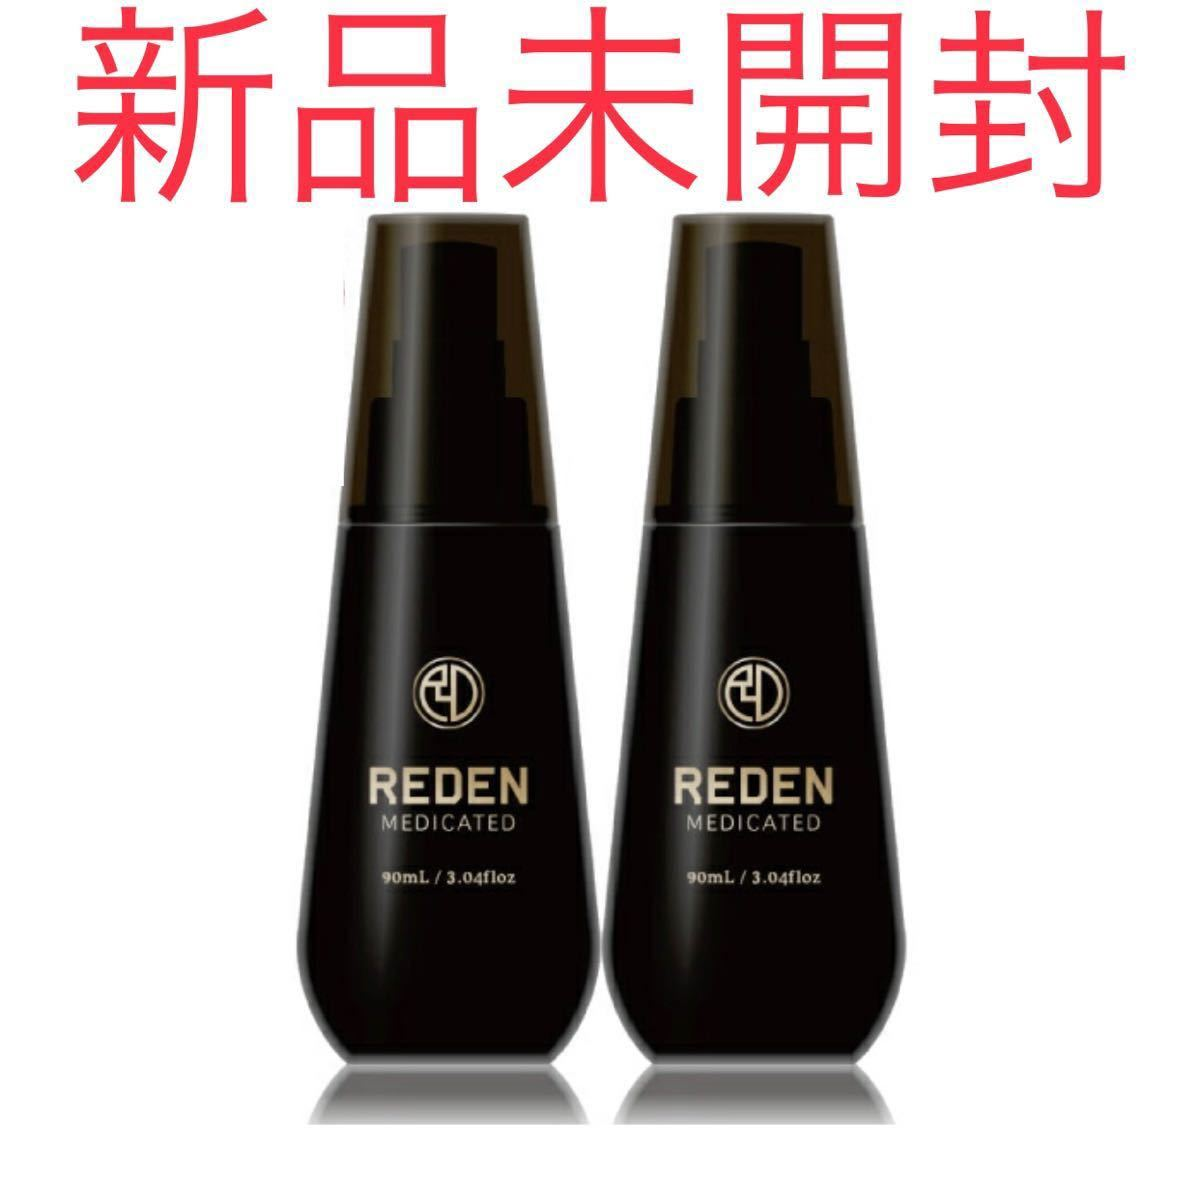 REDEN リデン 2本セット 薬用 育毛剤 無香料 育毛ローション トニック 医薬部外品 リデンシル スカルプケア 男性 女性